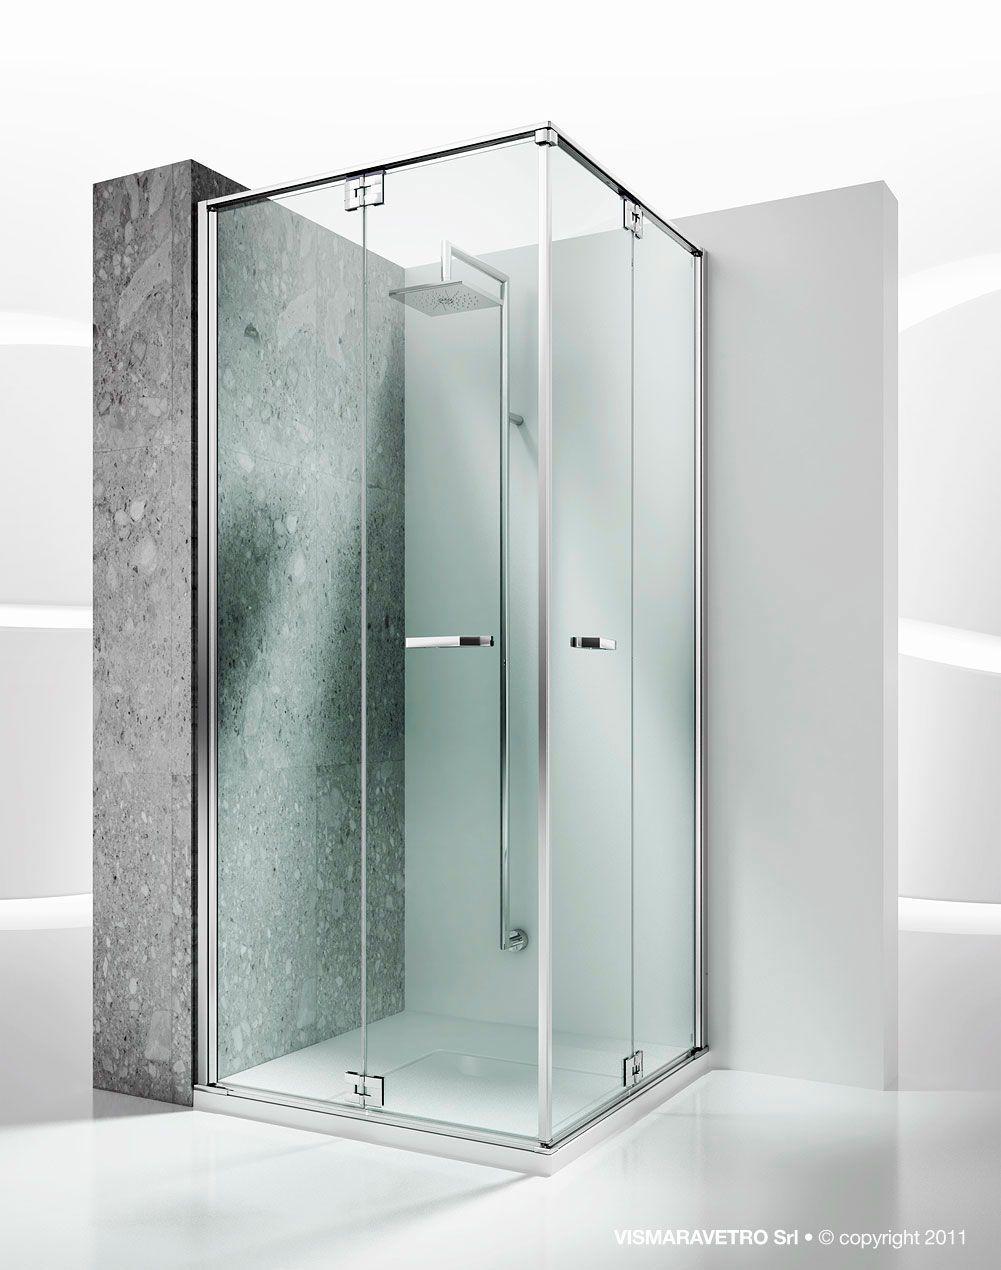 Glass Shower Cubicle Corner With Folding Door Replay Ra Ra Vismaravetro Shower Cubicles Corner Shower Enclosures Shower Enclosure